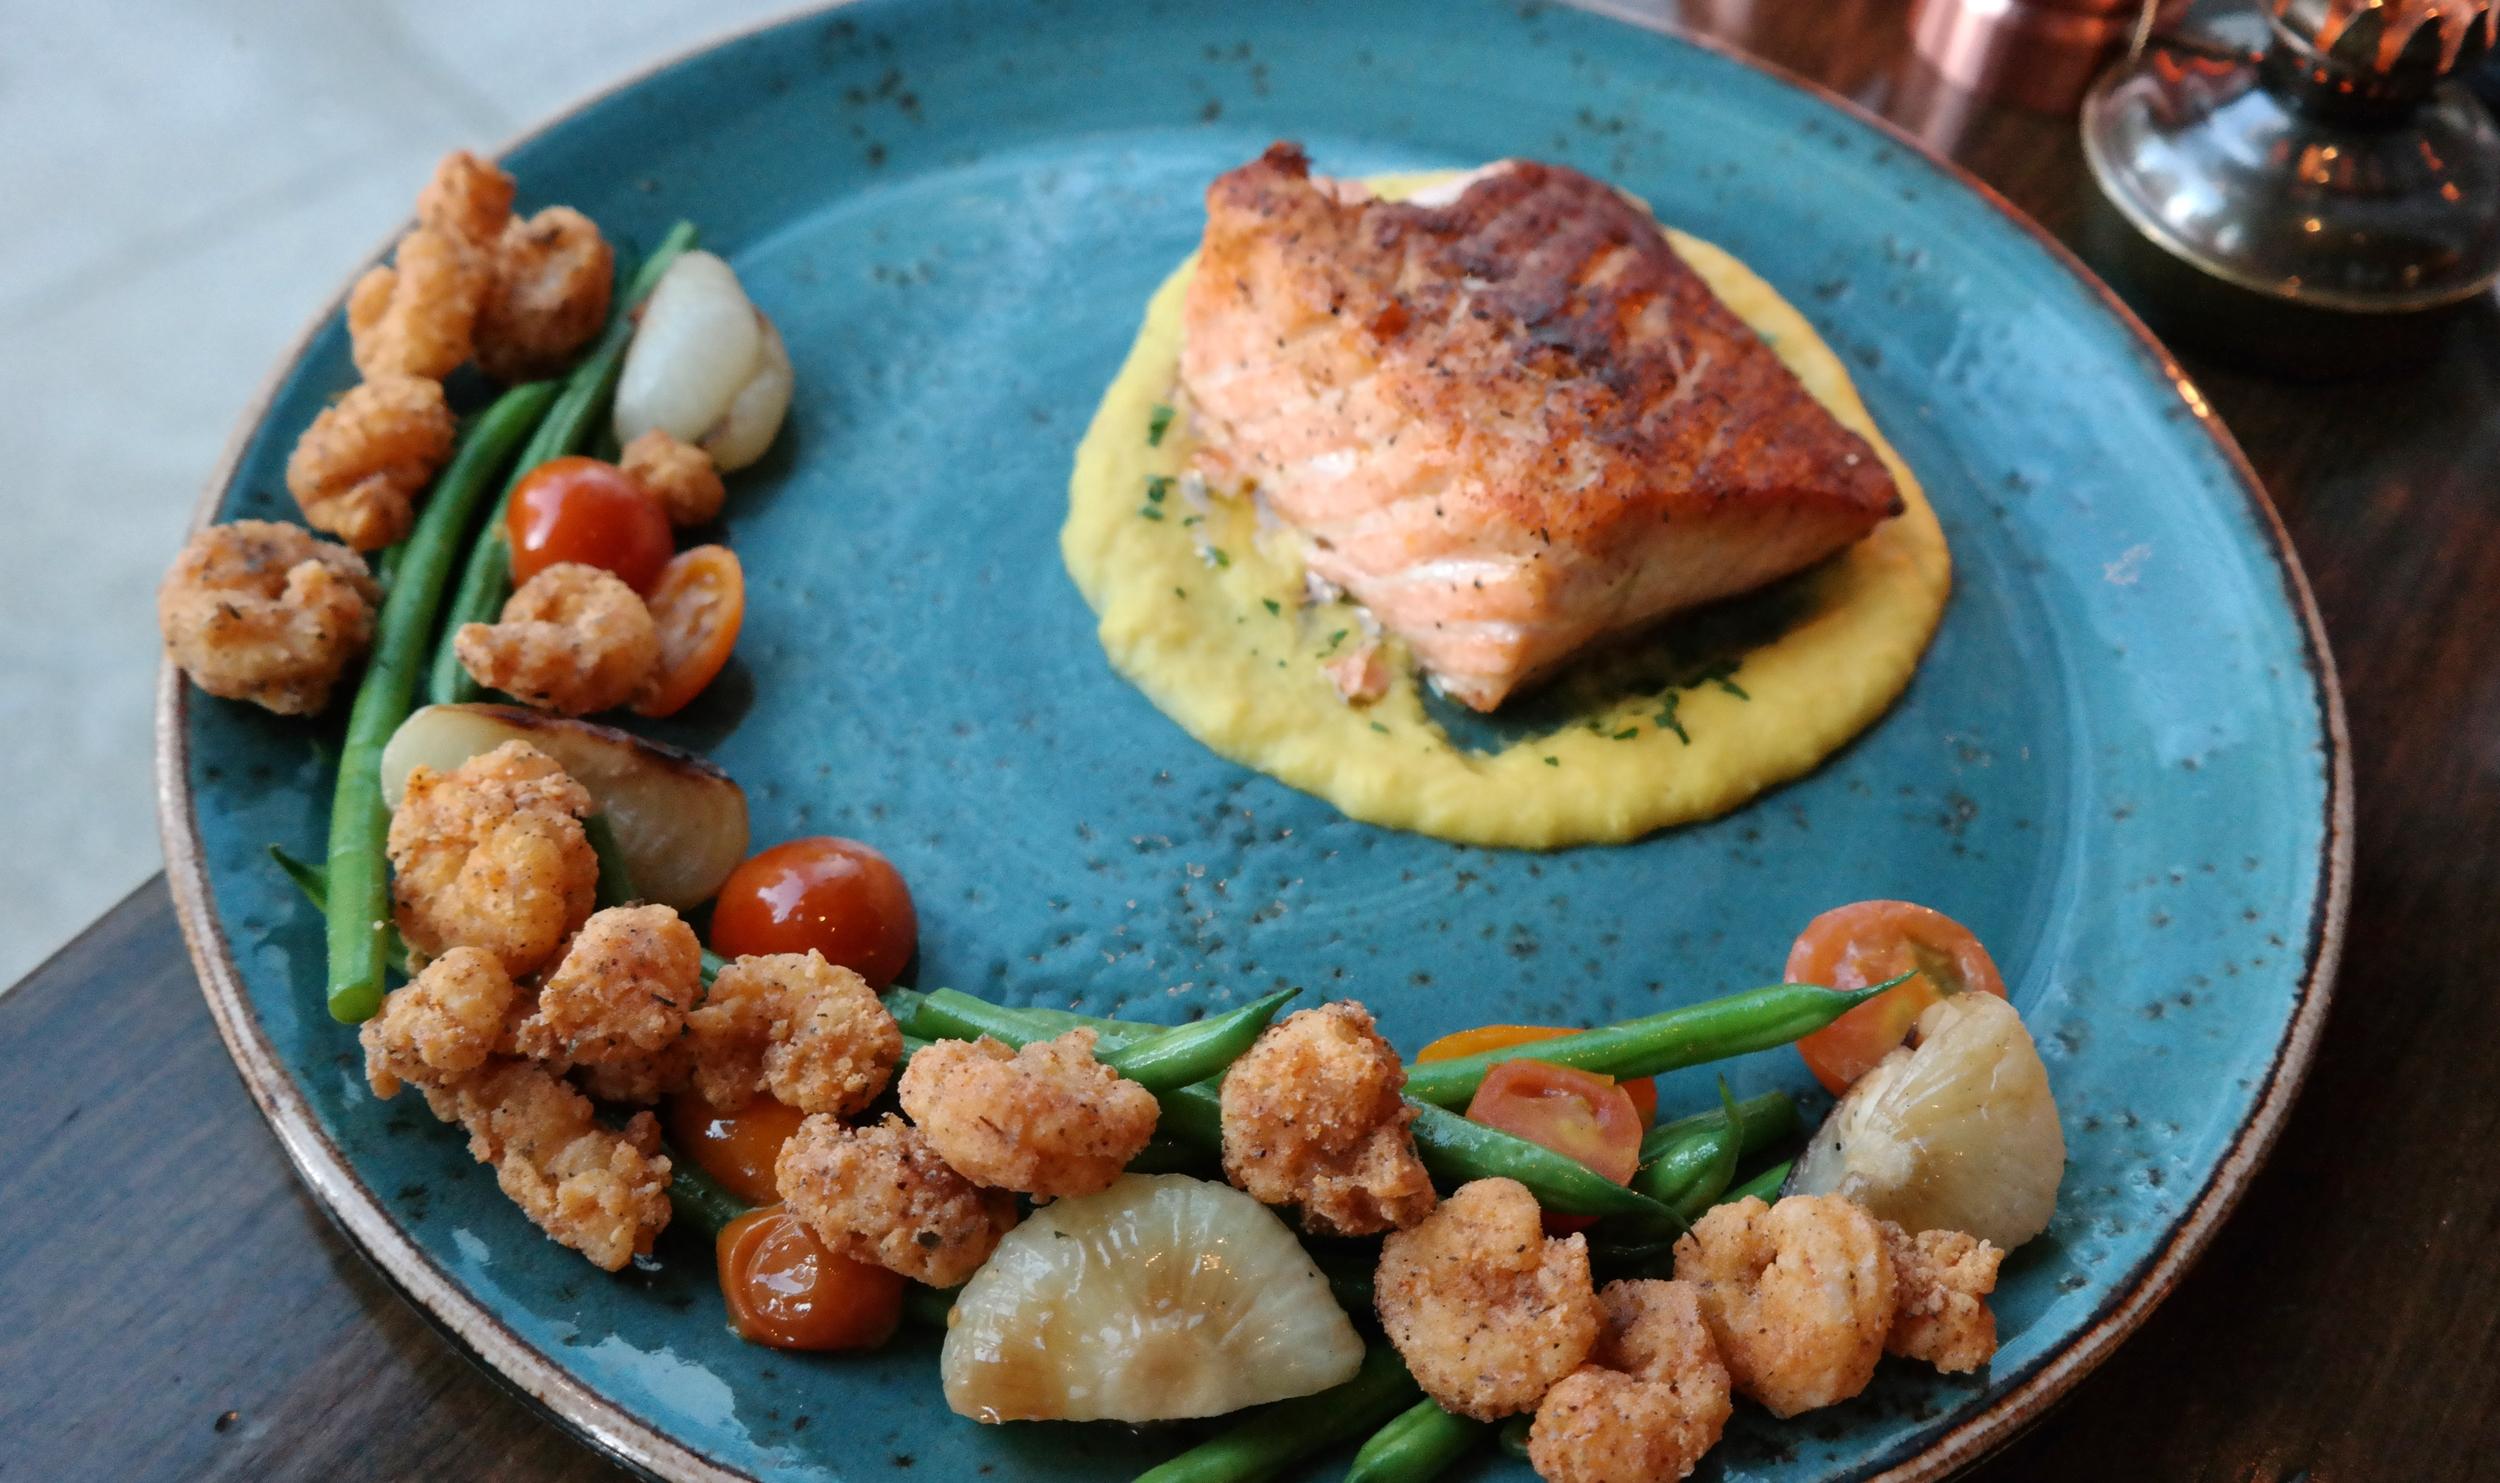 Salmon with corn puree and rock shrimp